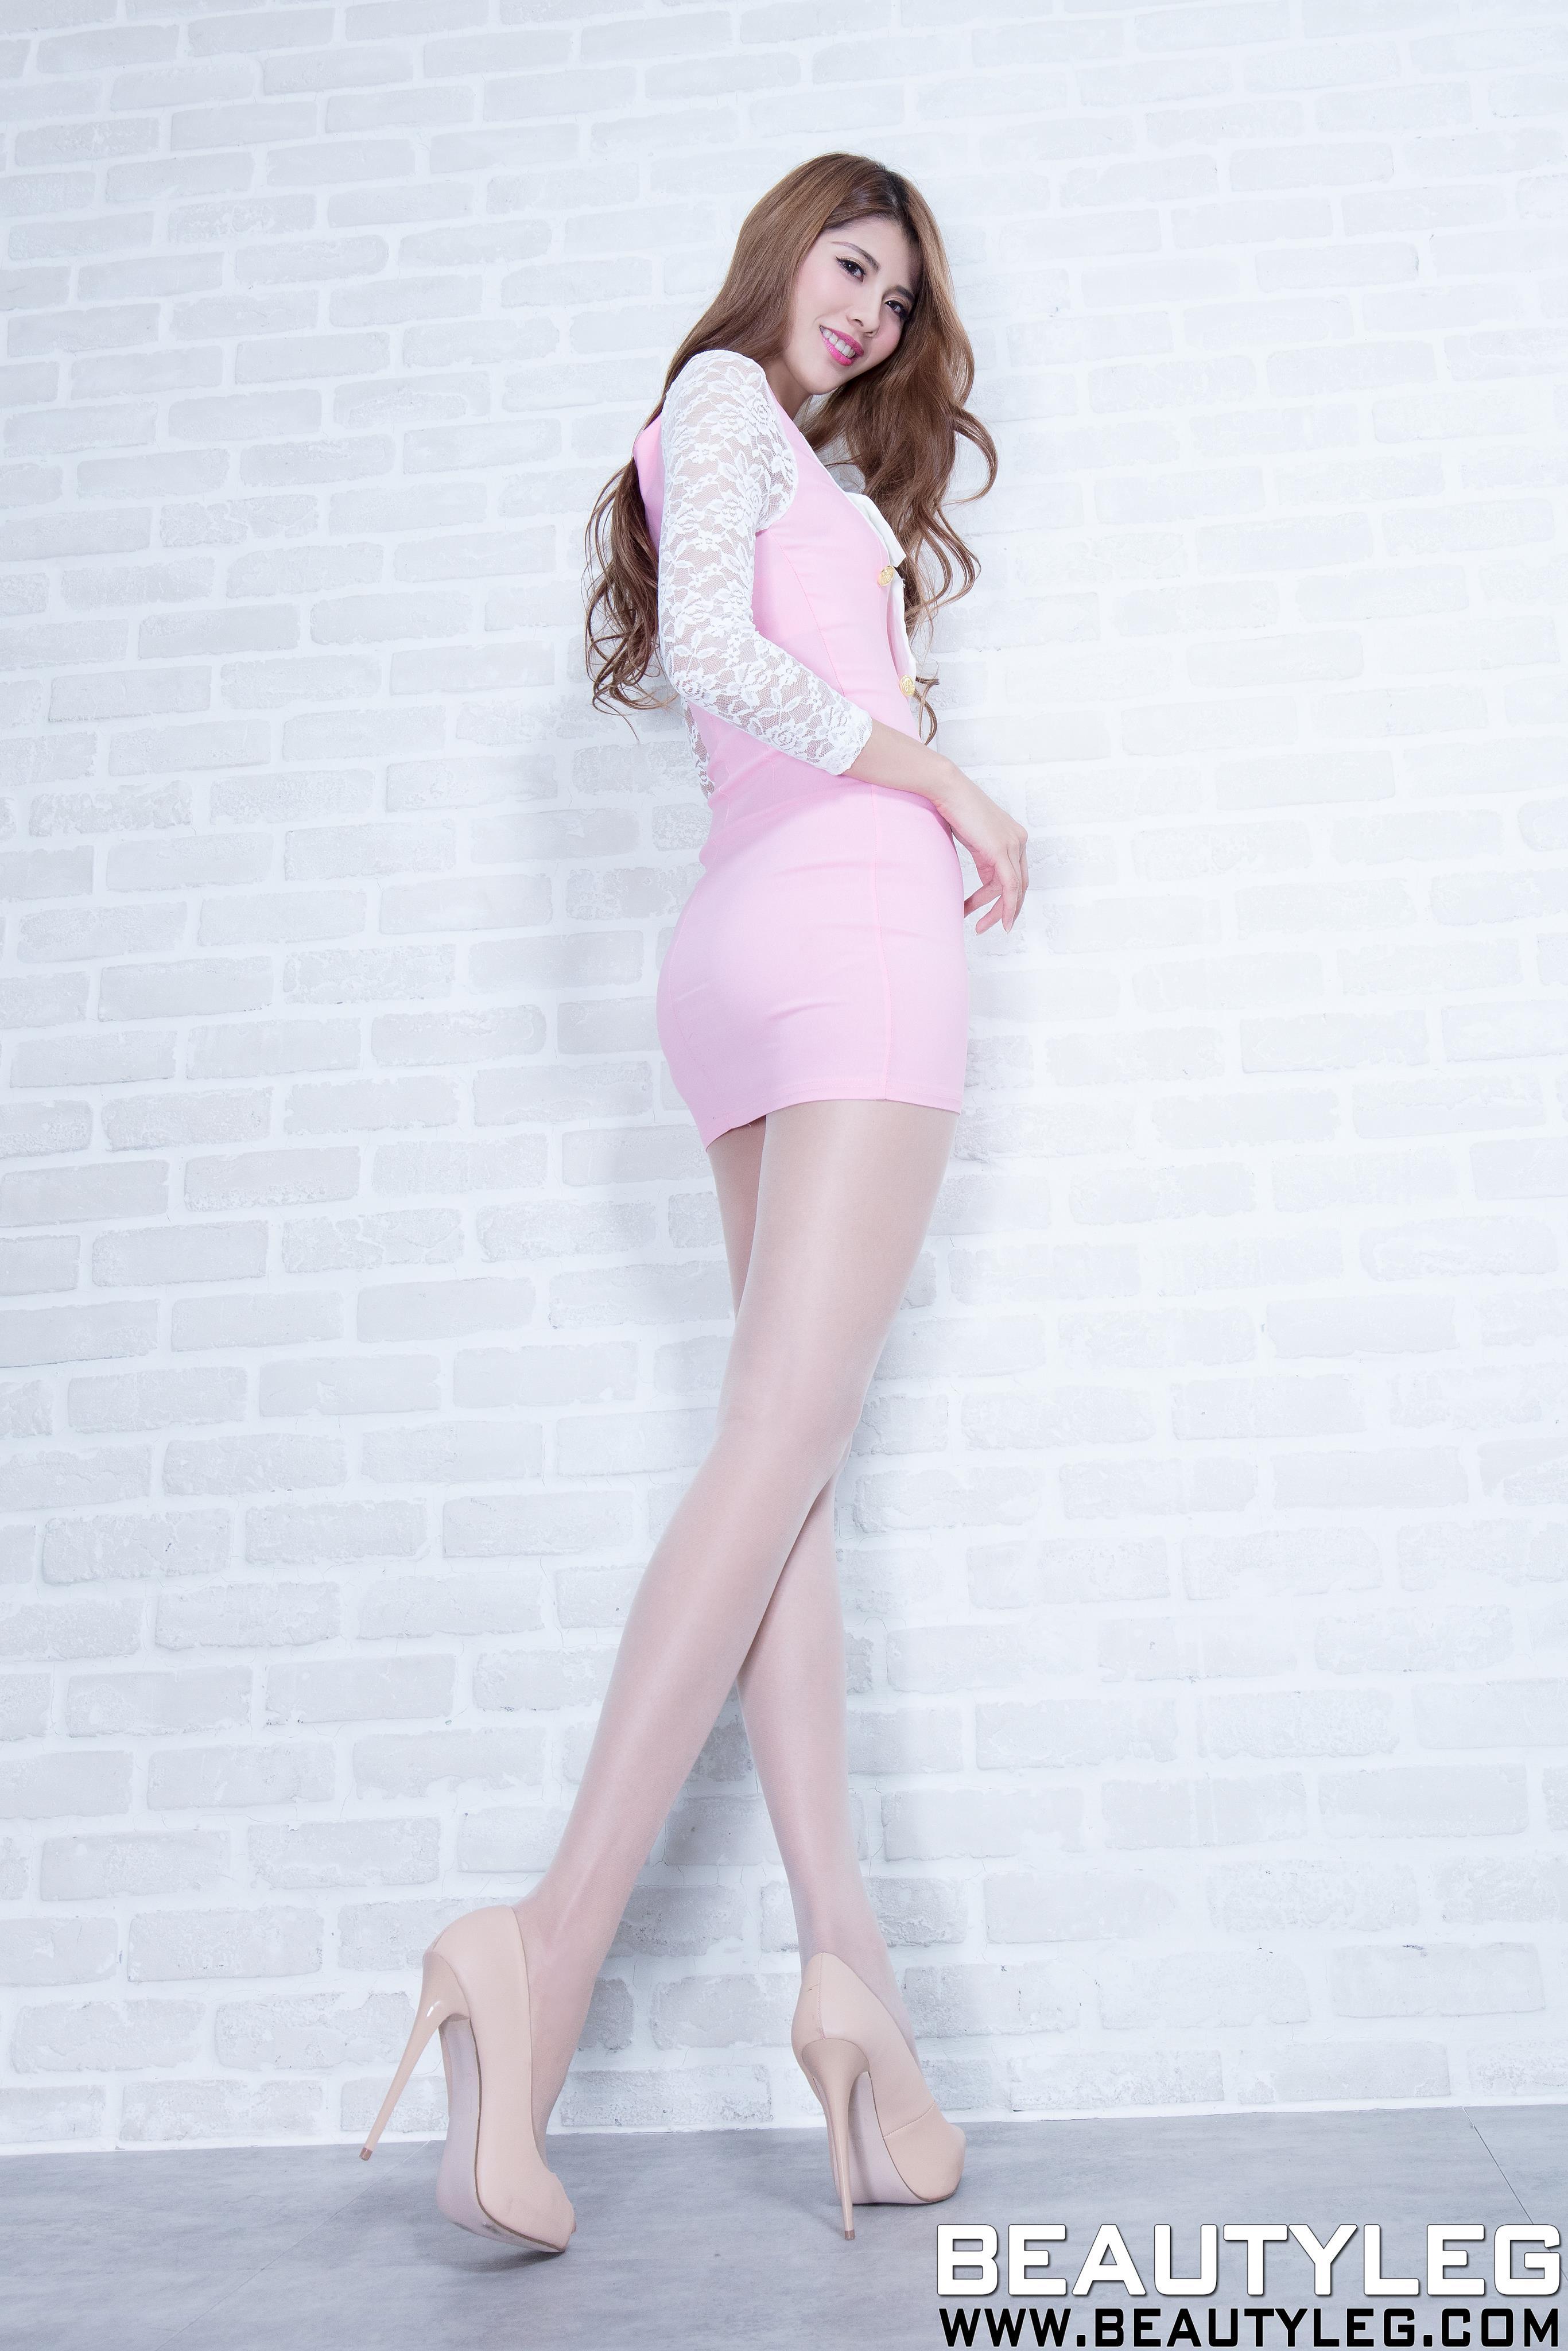 [beautyleg美腿写真]No.1618 Joanna 白色蕾丝衬衫与粉色吊带连衣裙加肉色丝袜美腿性感私房写真集